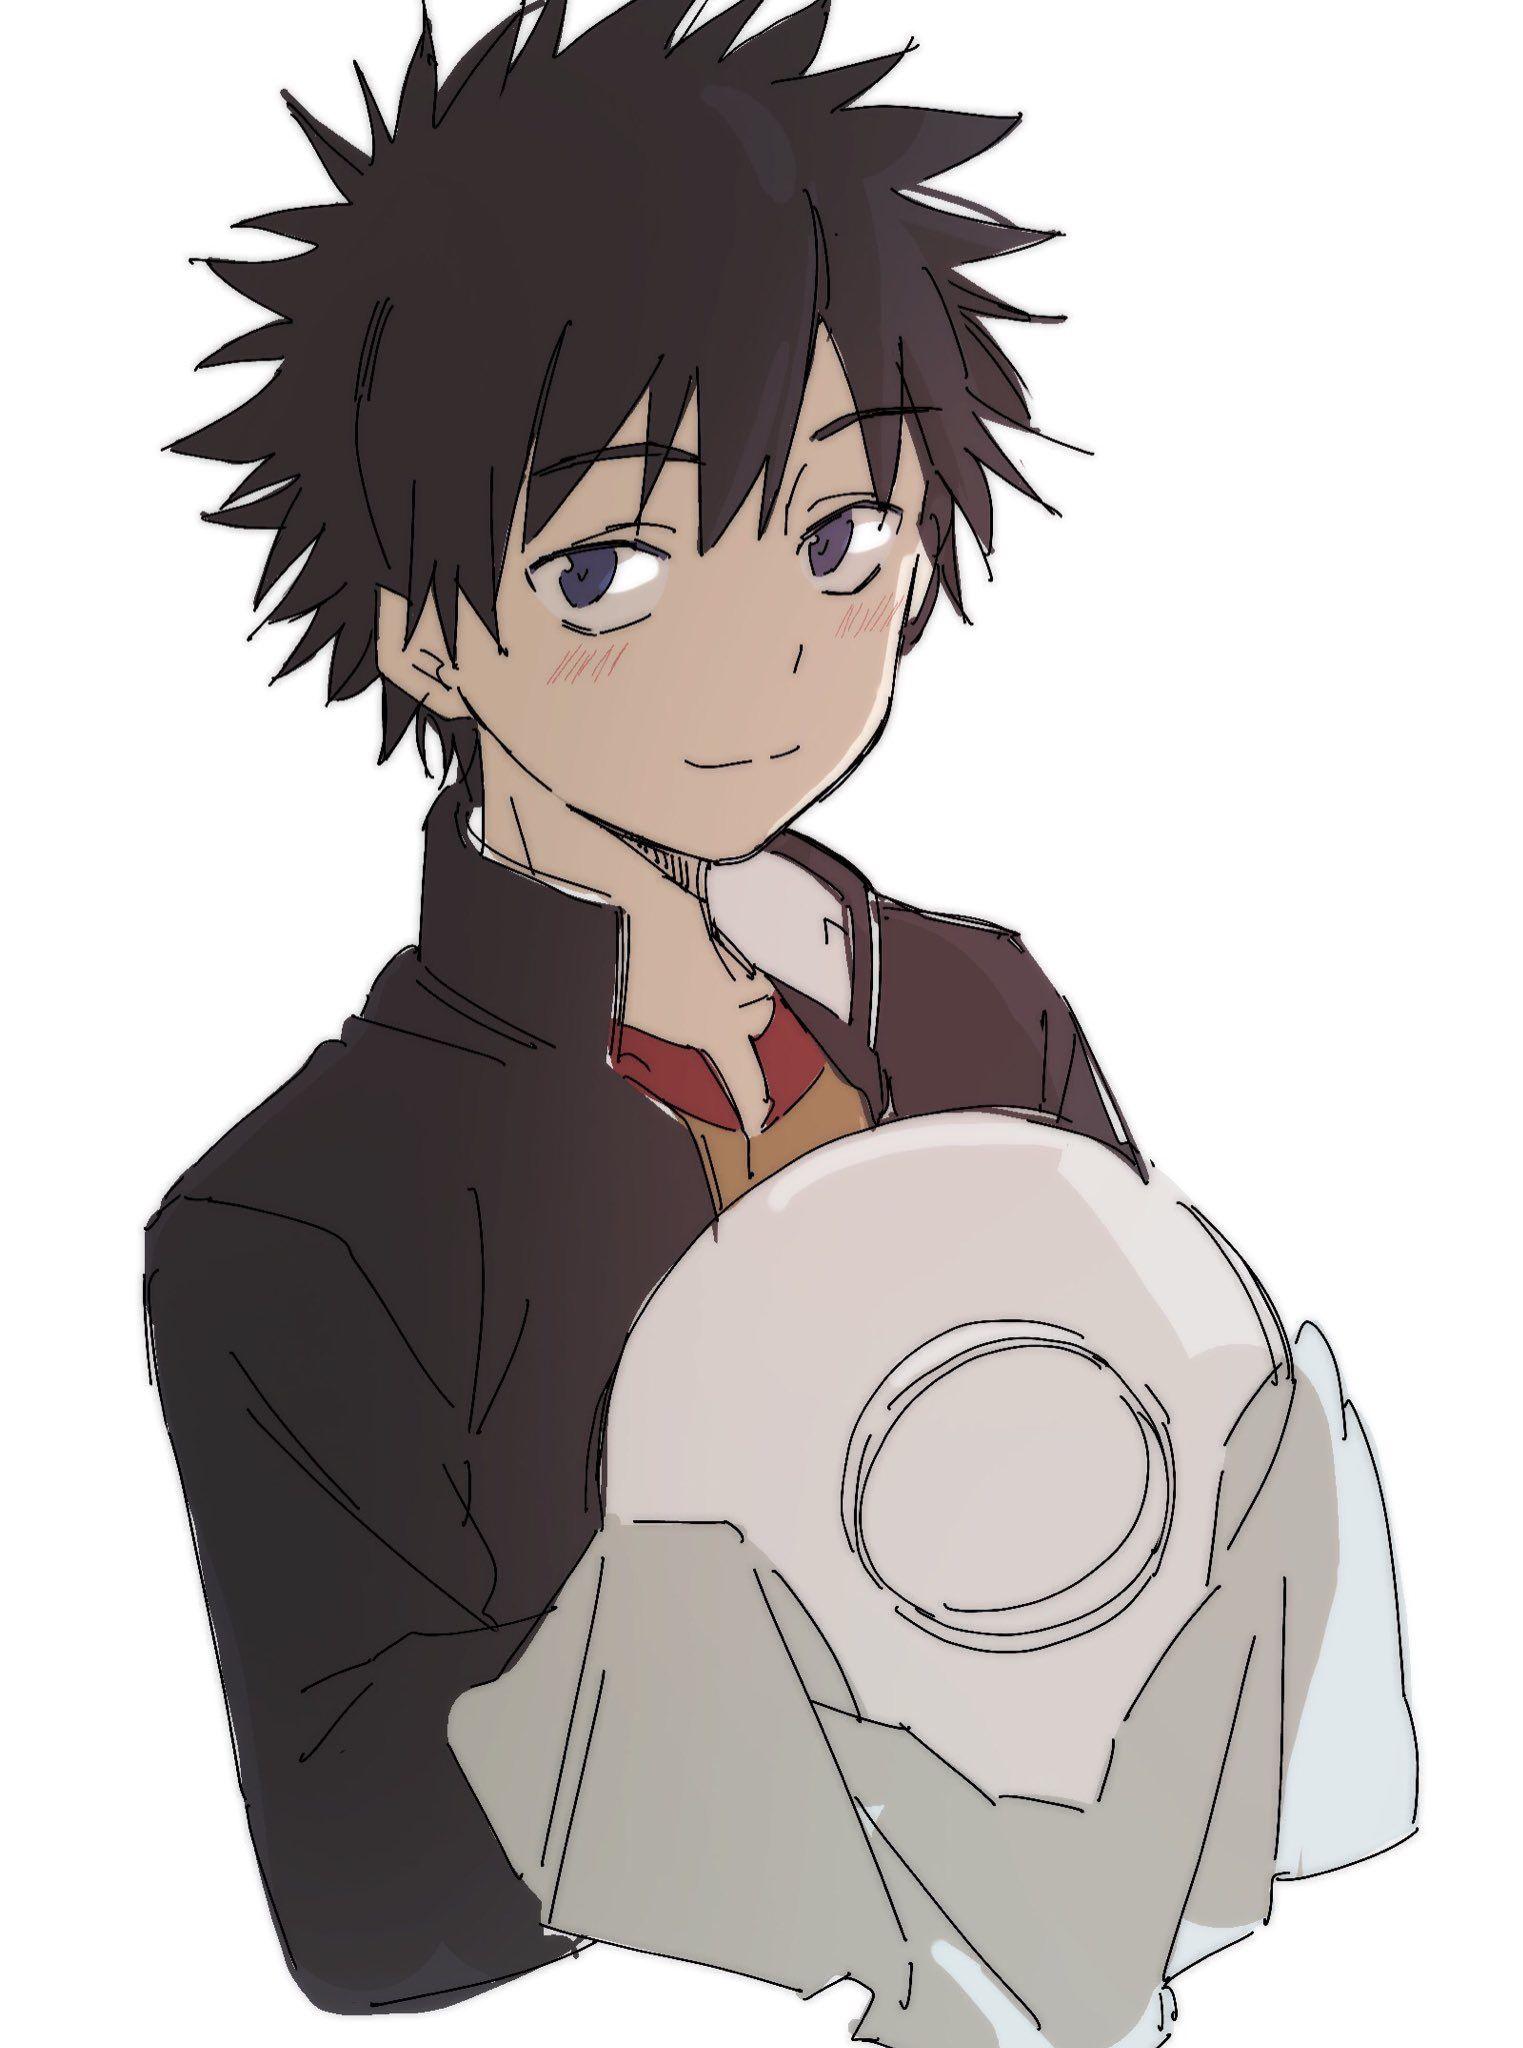 Kamijou Touma Anime, A certain scientific railgun, A